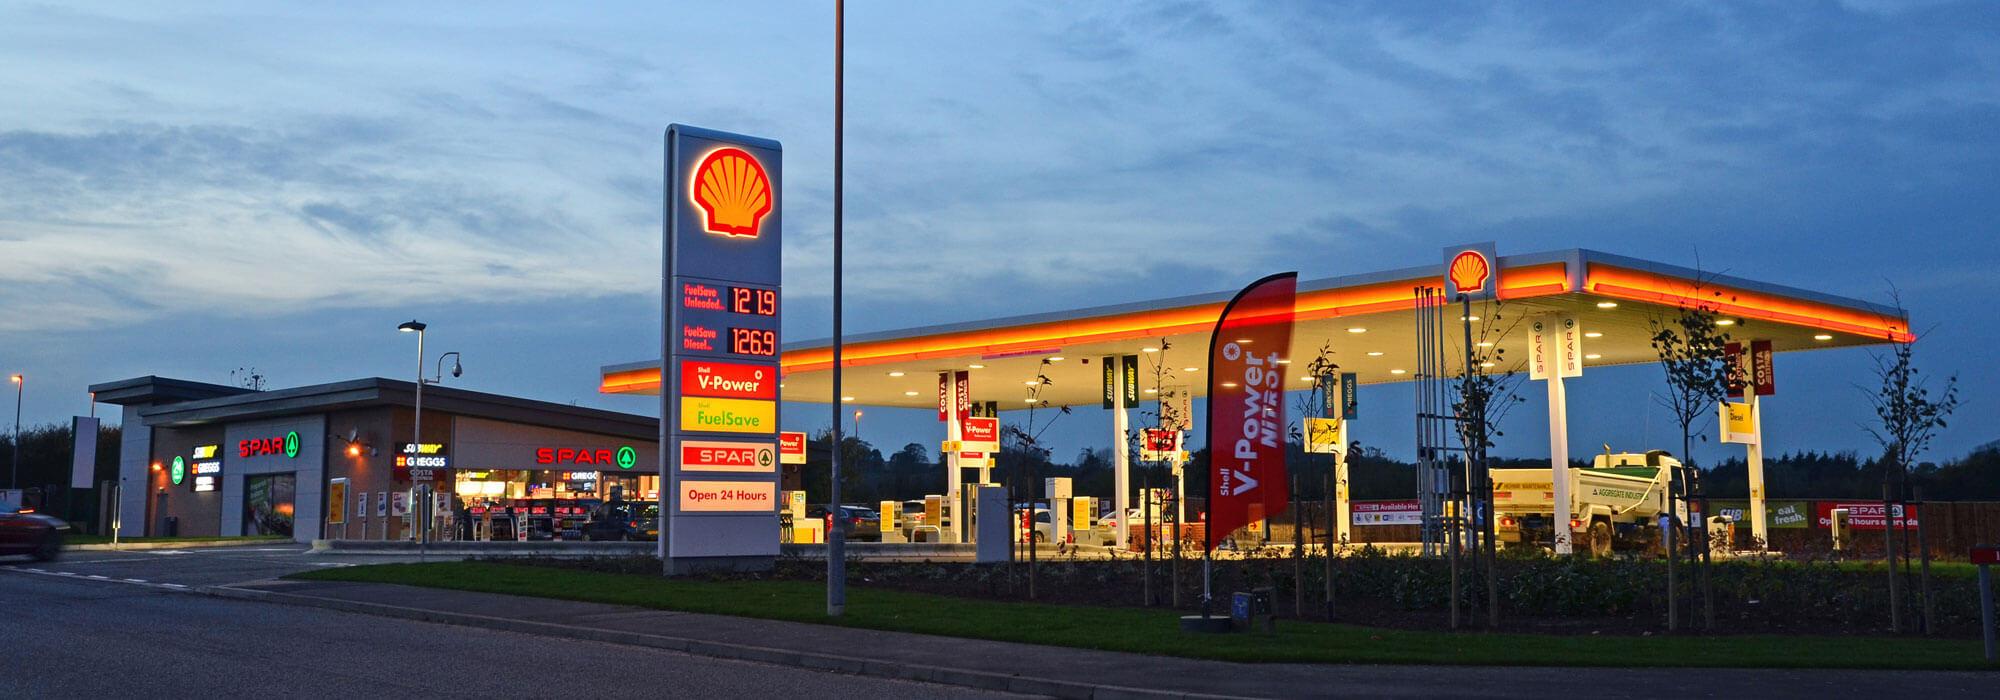 How to setup a Petrol Filling Stationin Nigeria